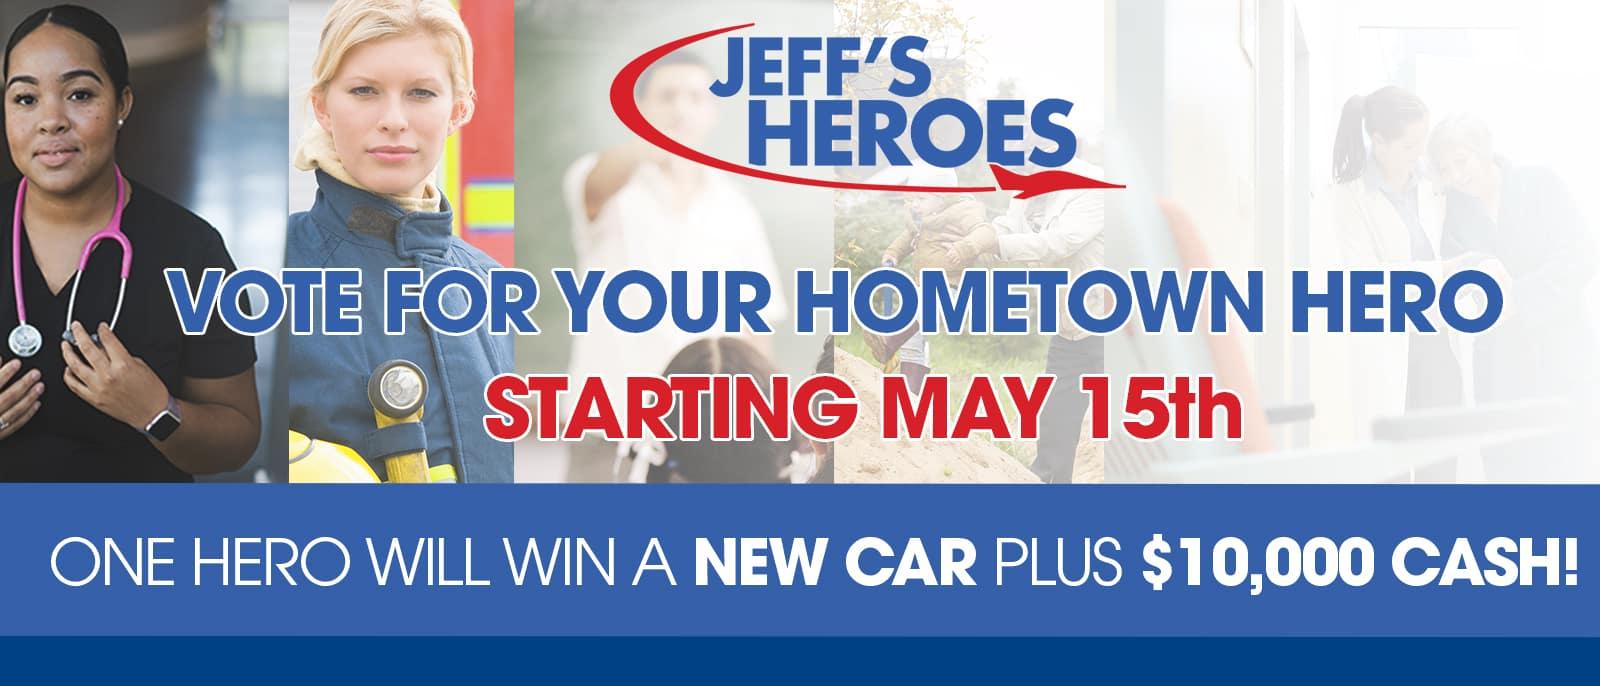 Slide 4.29.21 Jeffs Heroes